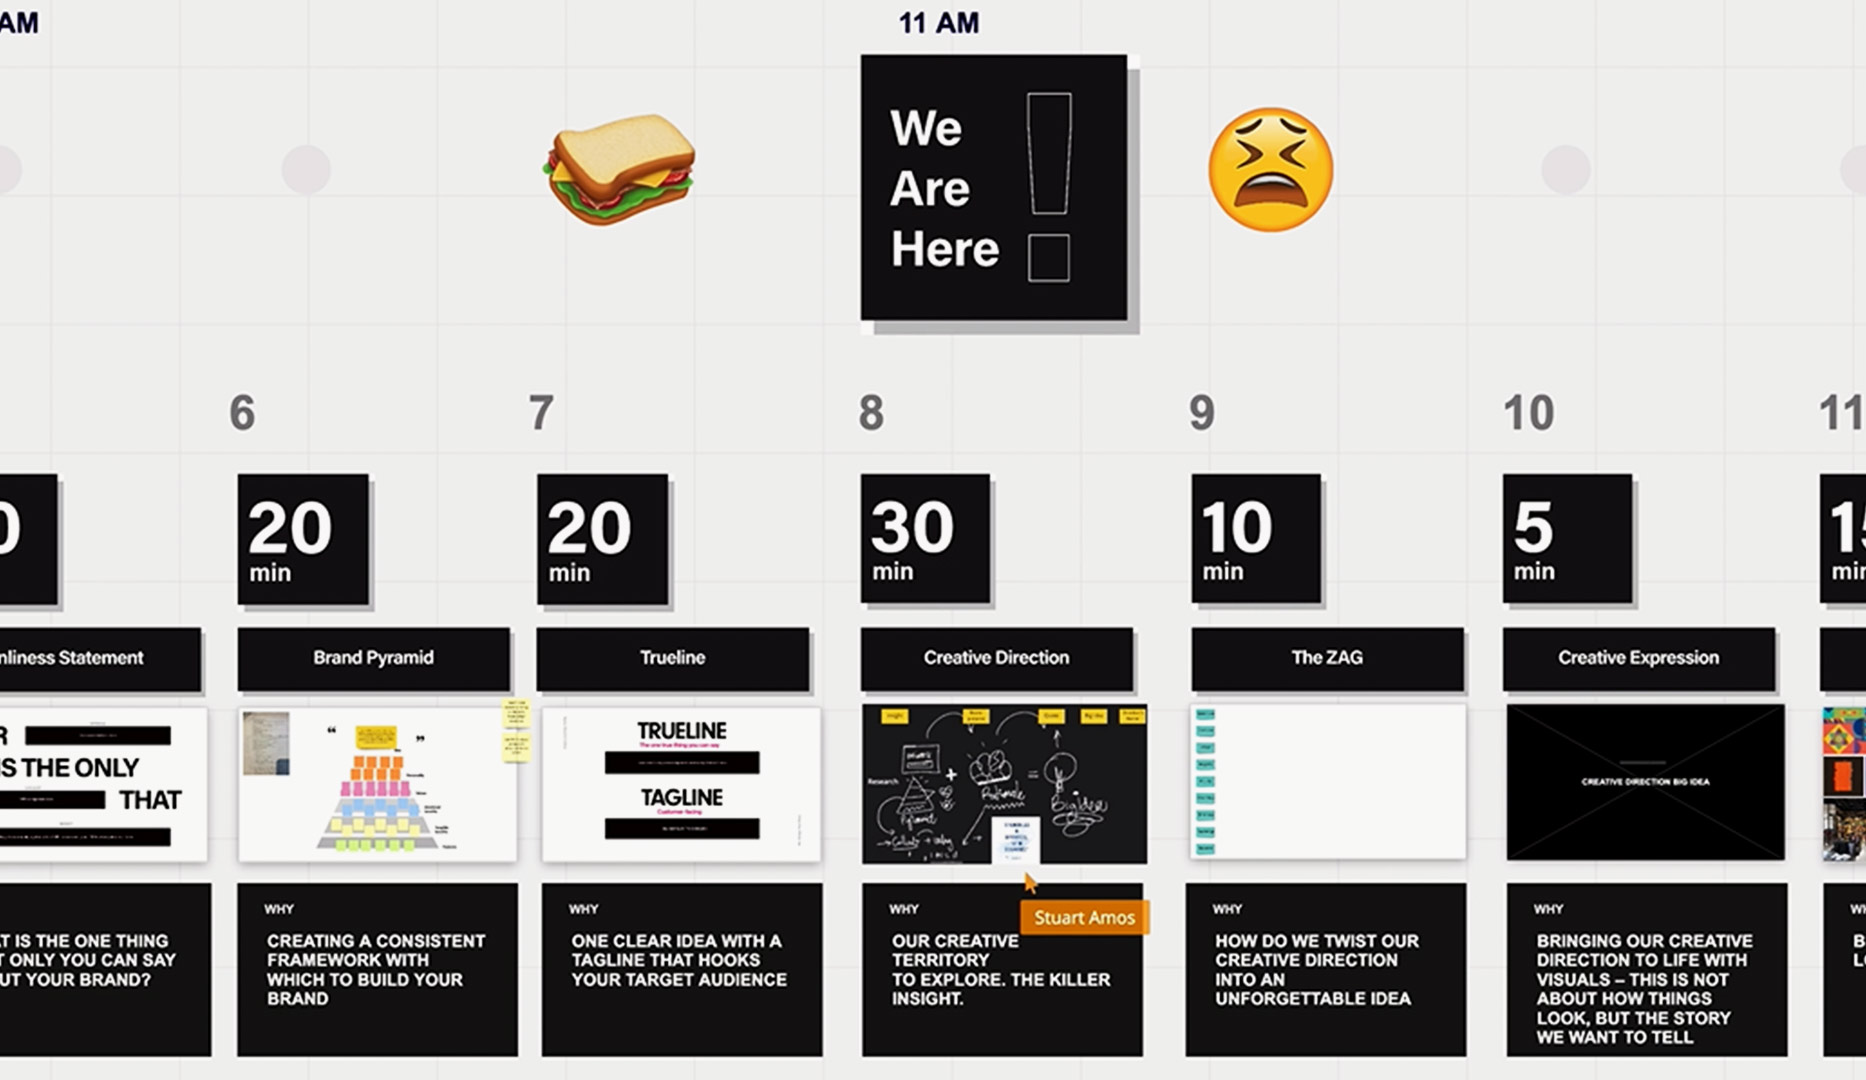 AIW BrandSprint Timelapse